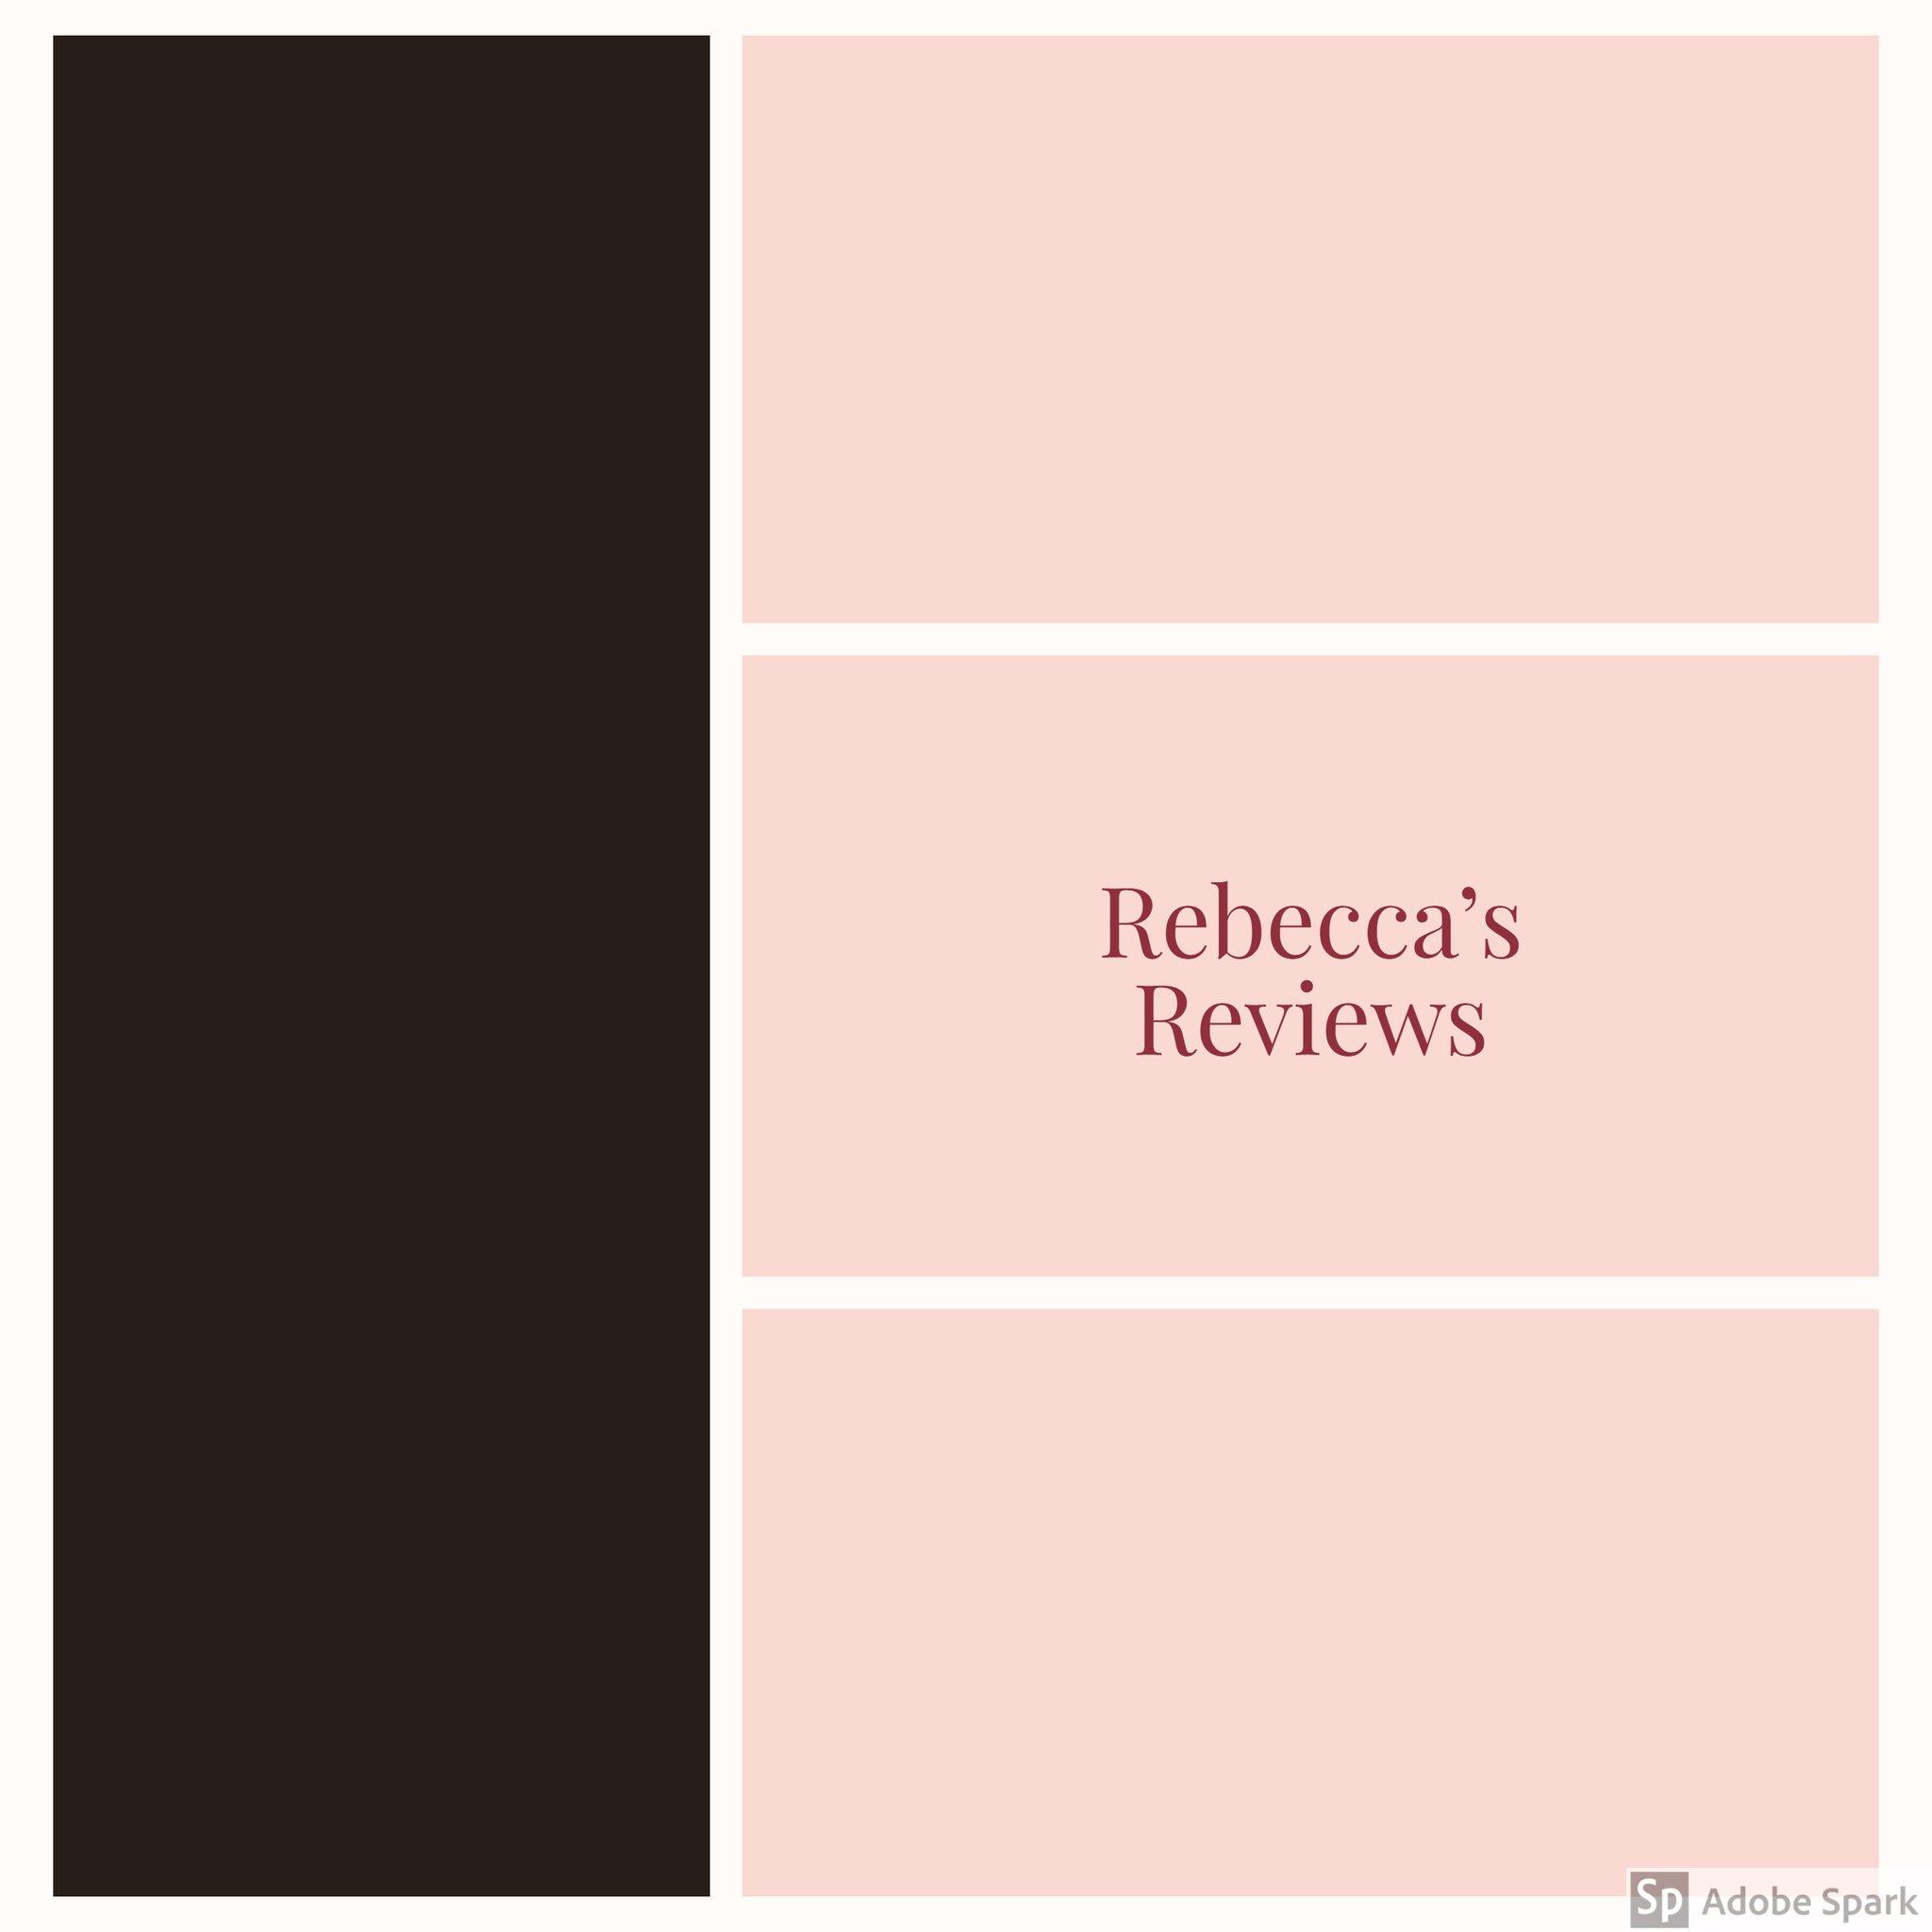 Rebecca's Reviews